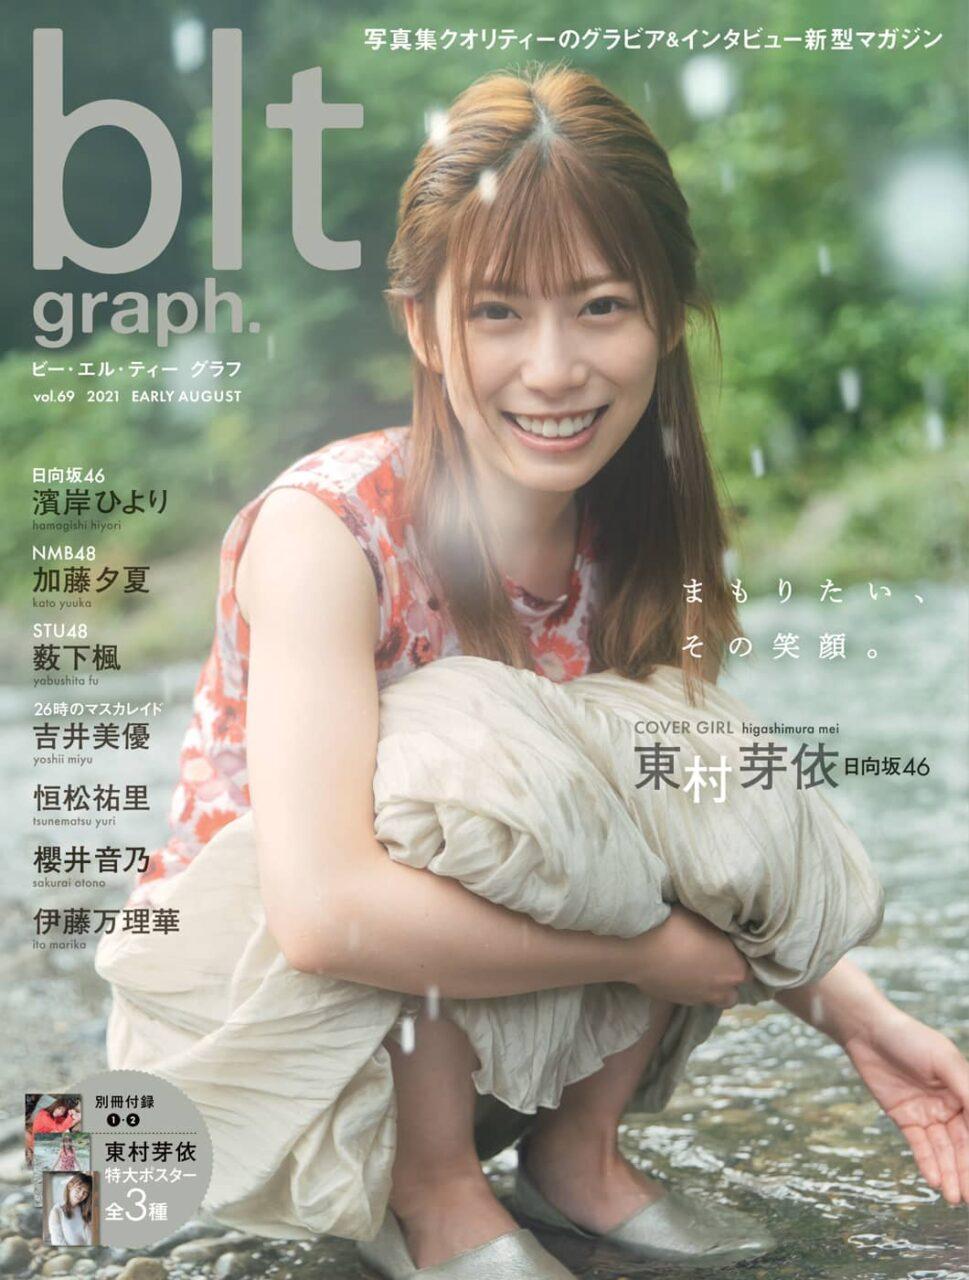 NMB48 加藤夕夏、STU48 薮下楓、グラビア掲載!「blt graph. vol.69」本日8/6発売!